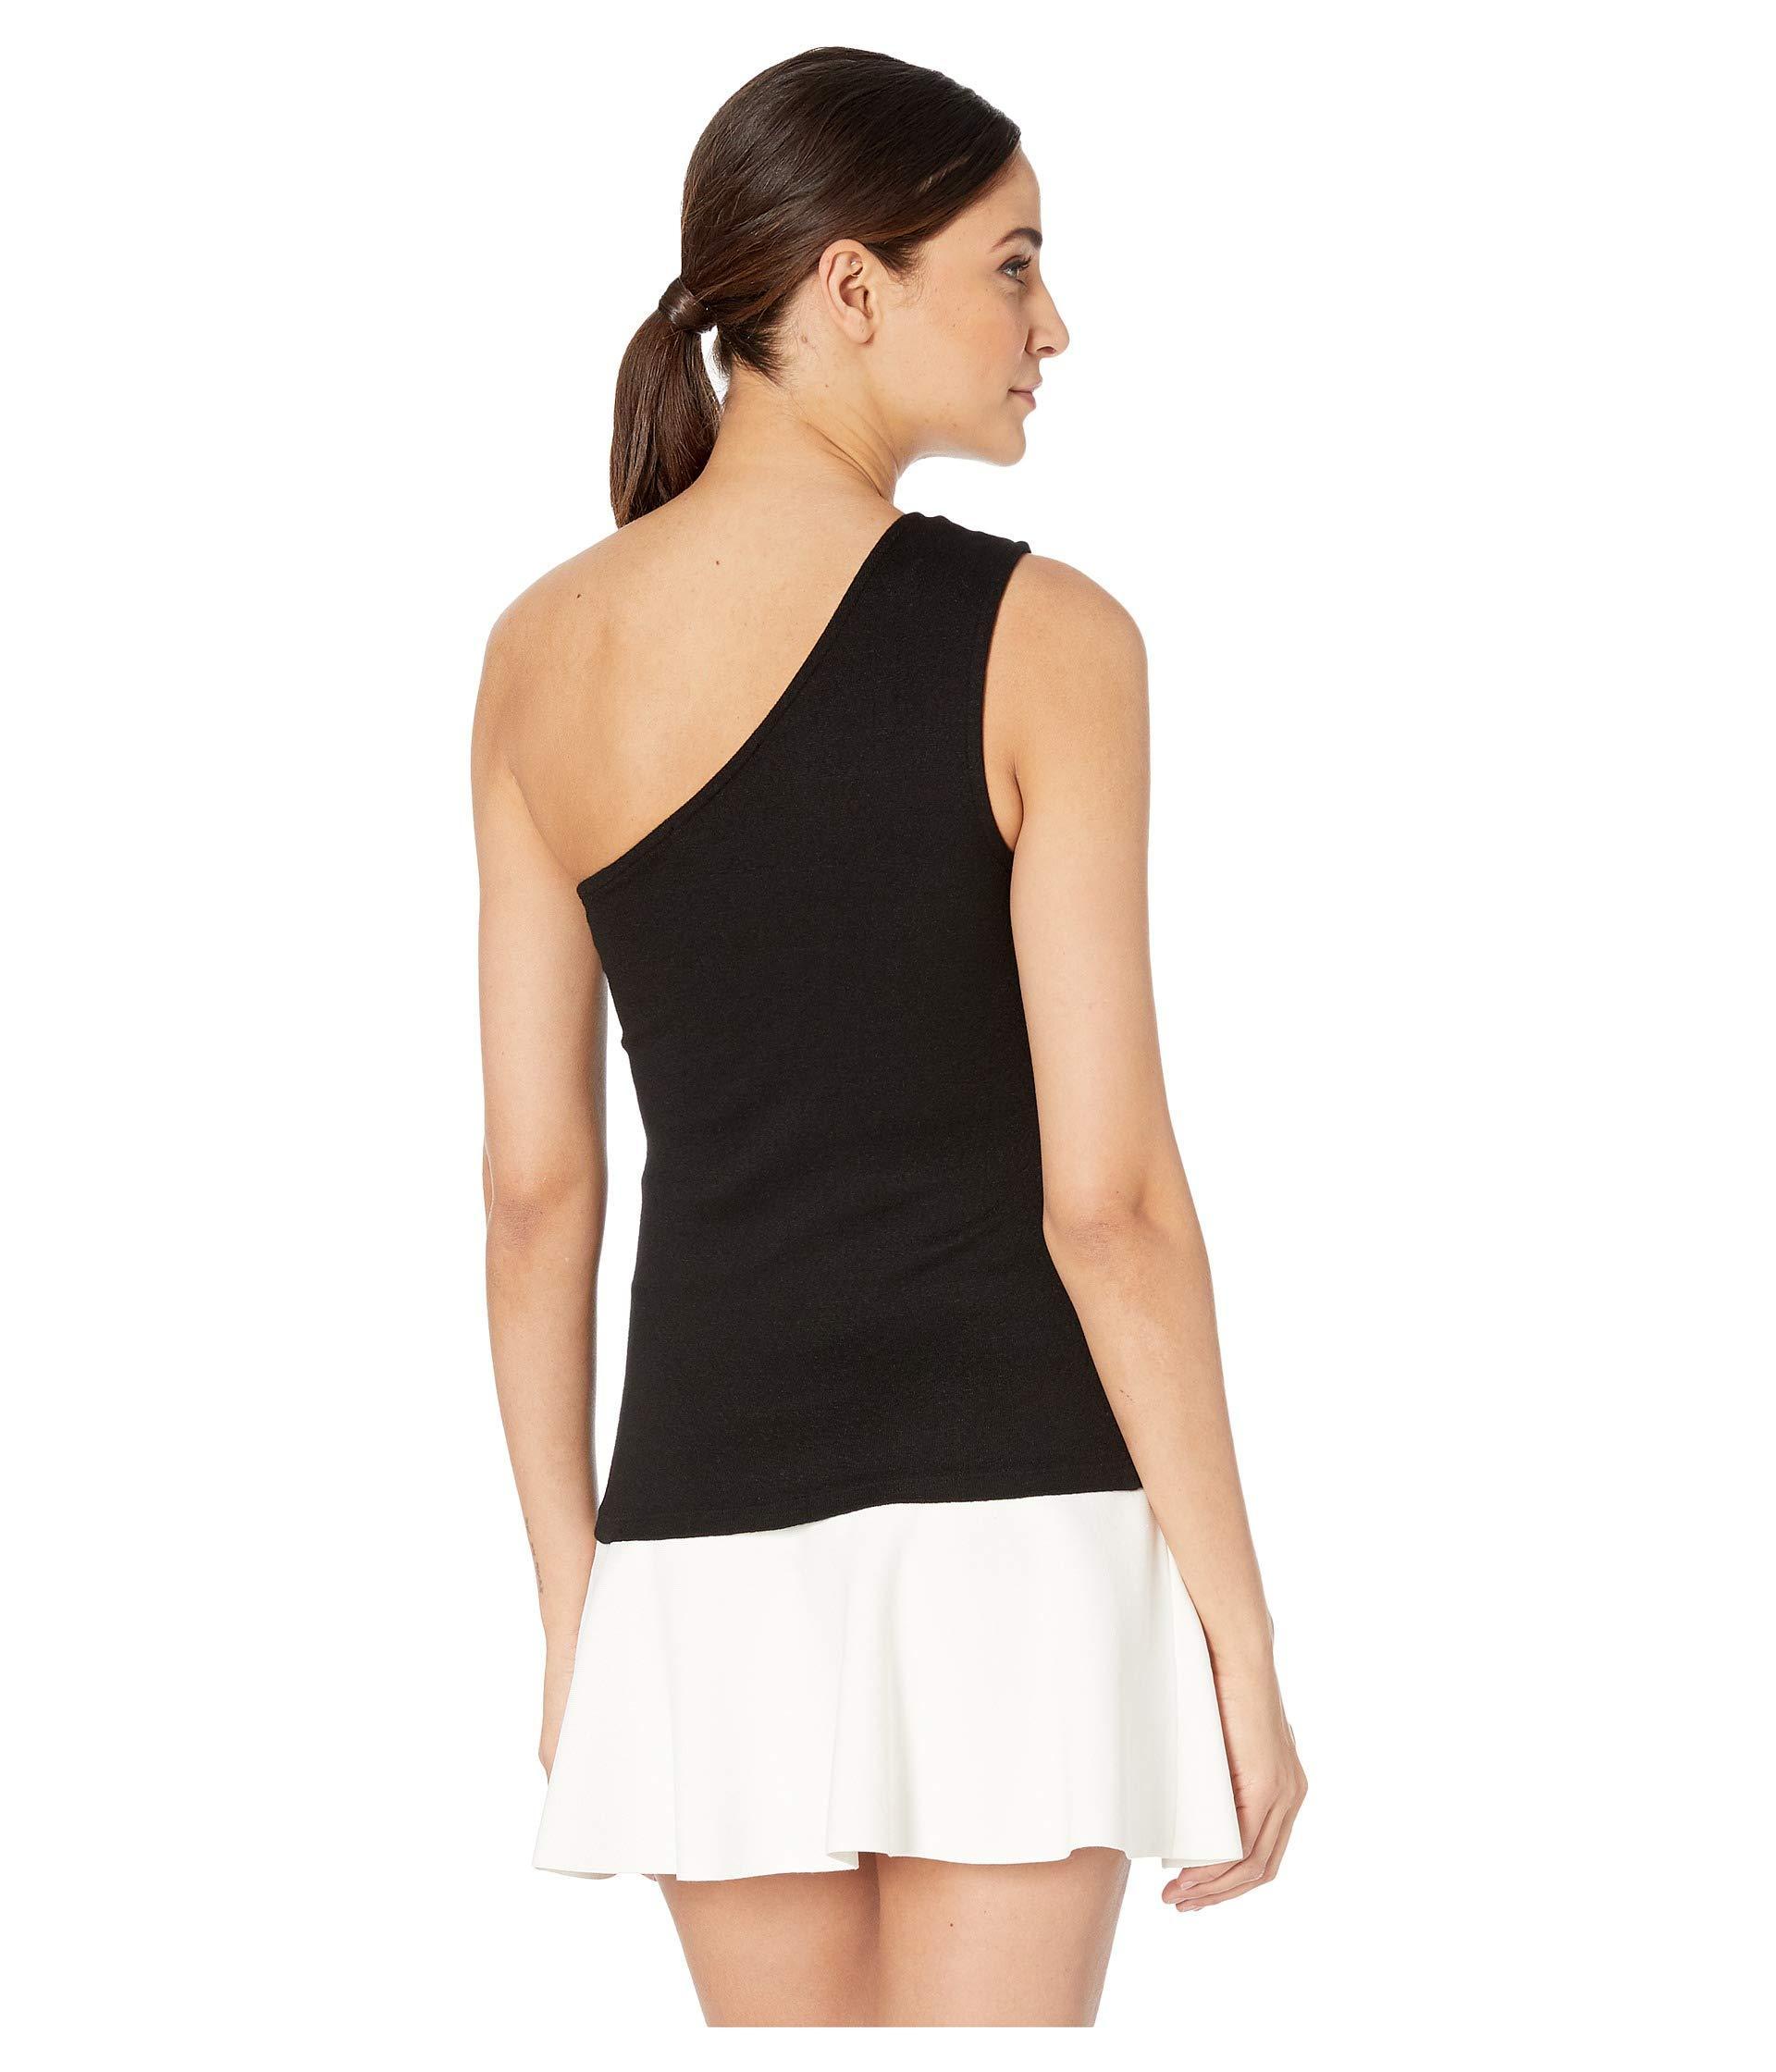 b07a13dd5a9 ... Demi Shine One Shoulder Tank (black) Women's Clothing - Lyst. View  fullscreen